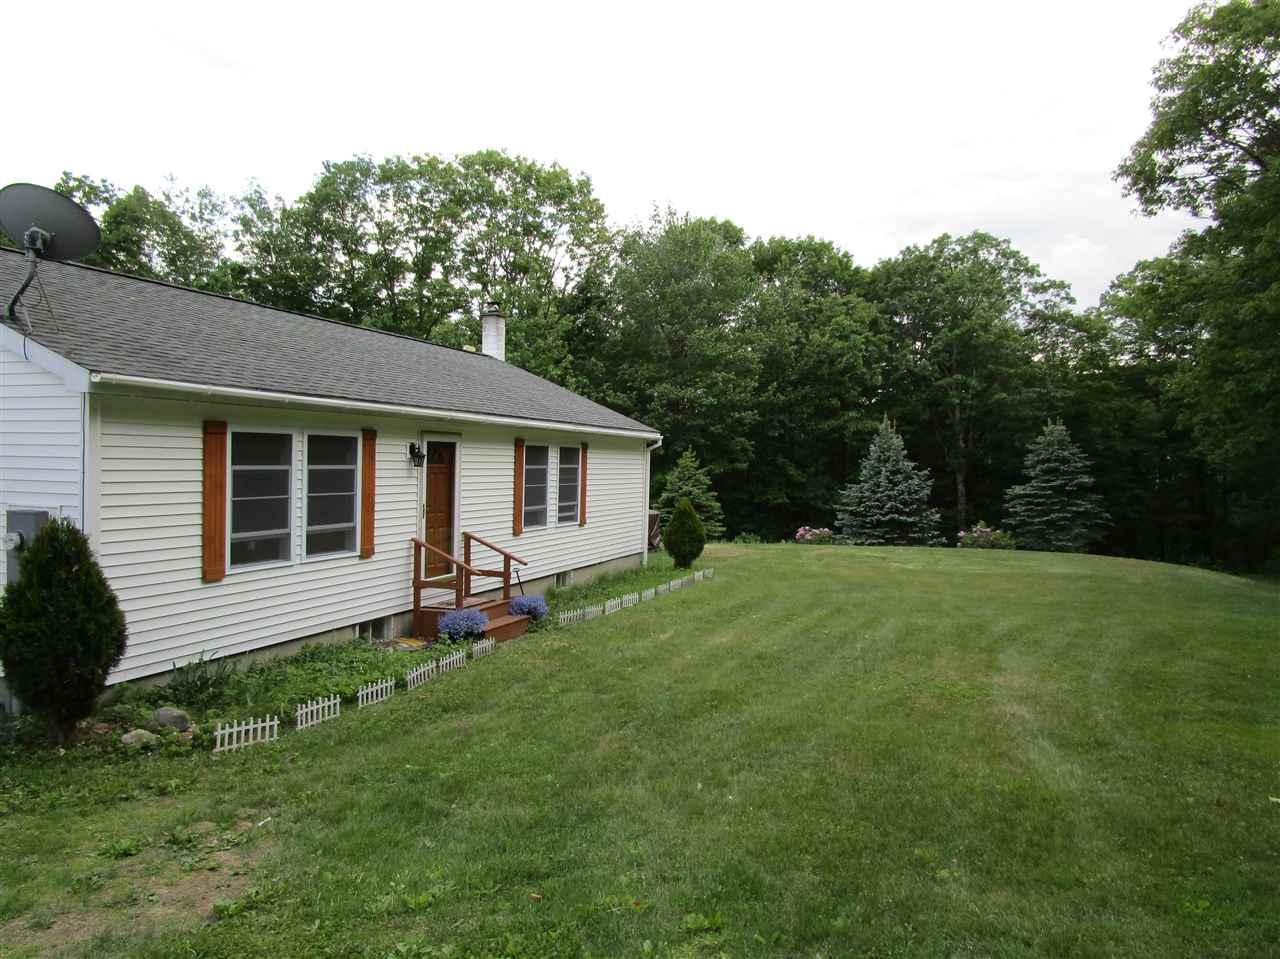 MLS 4710642: 67 Sky Pond, New Hampton NH